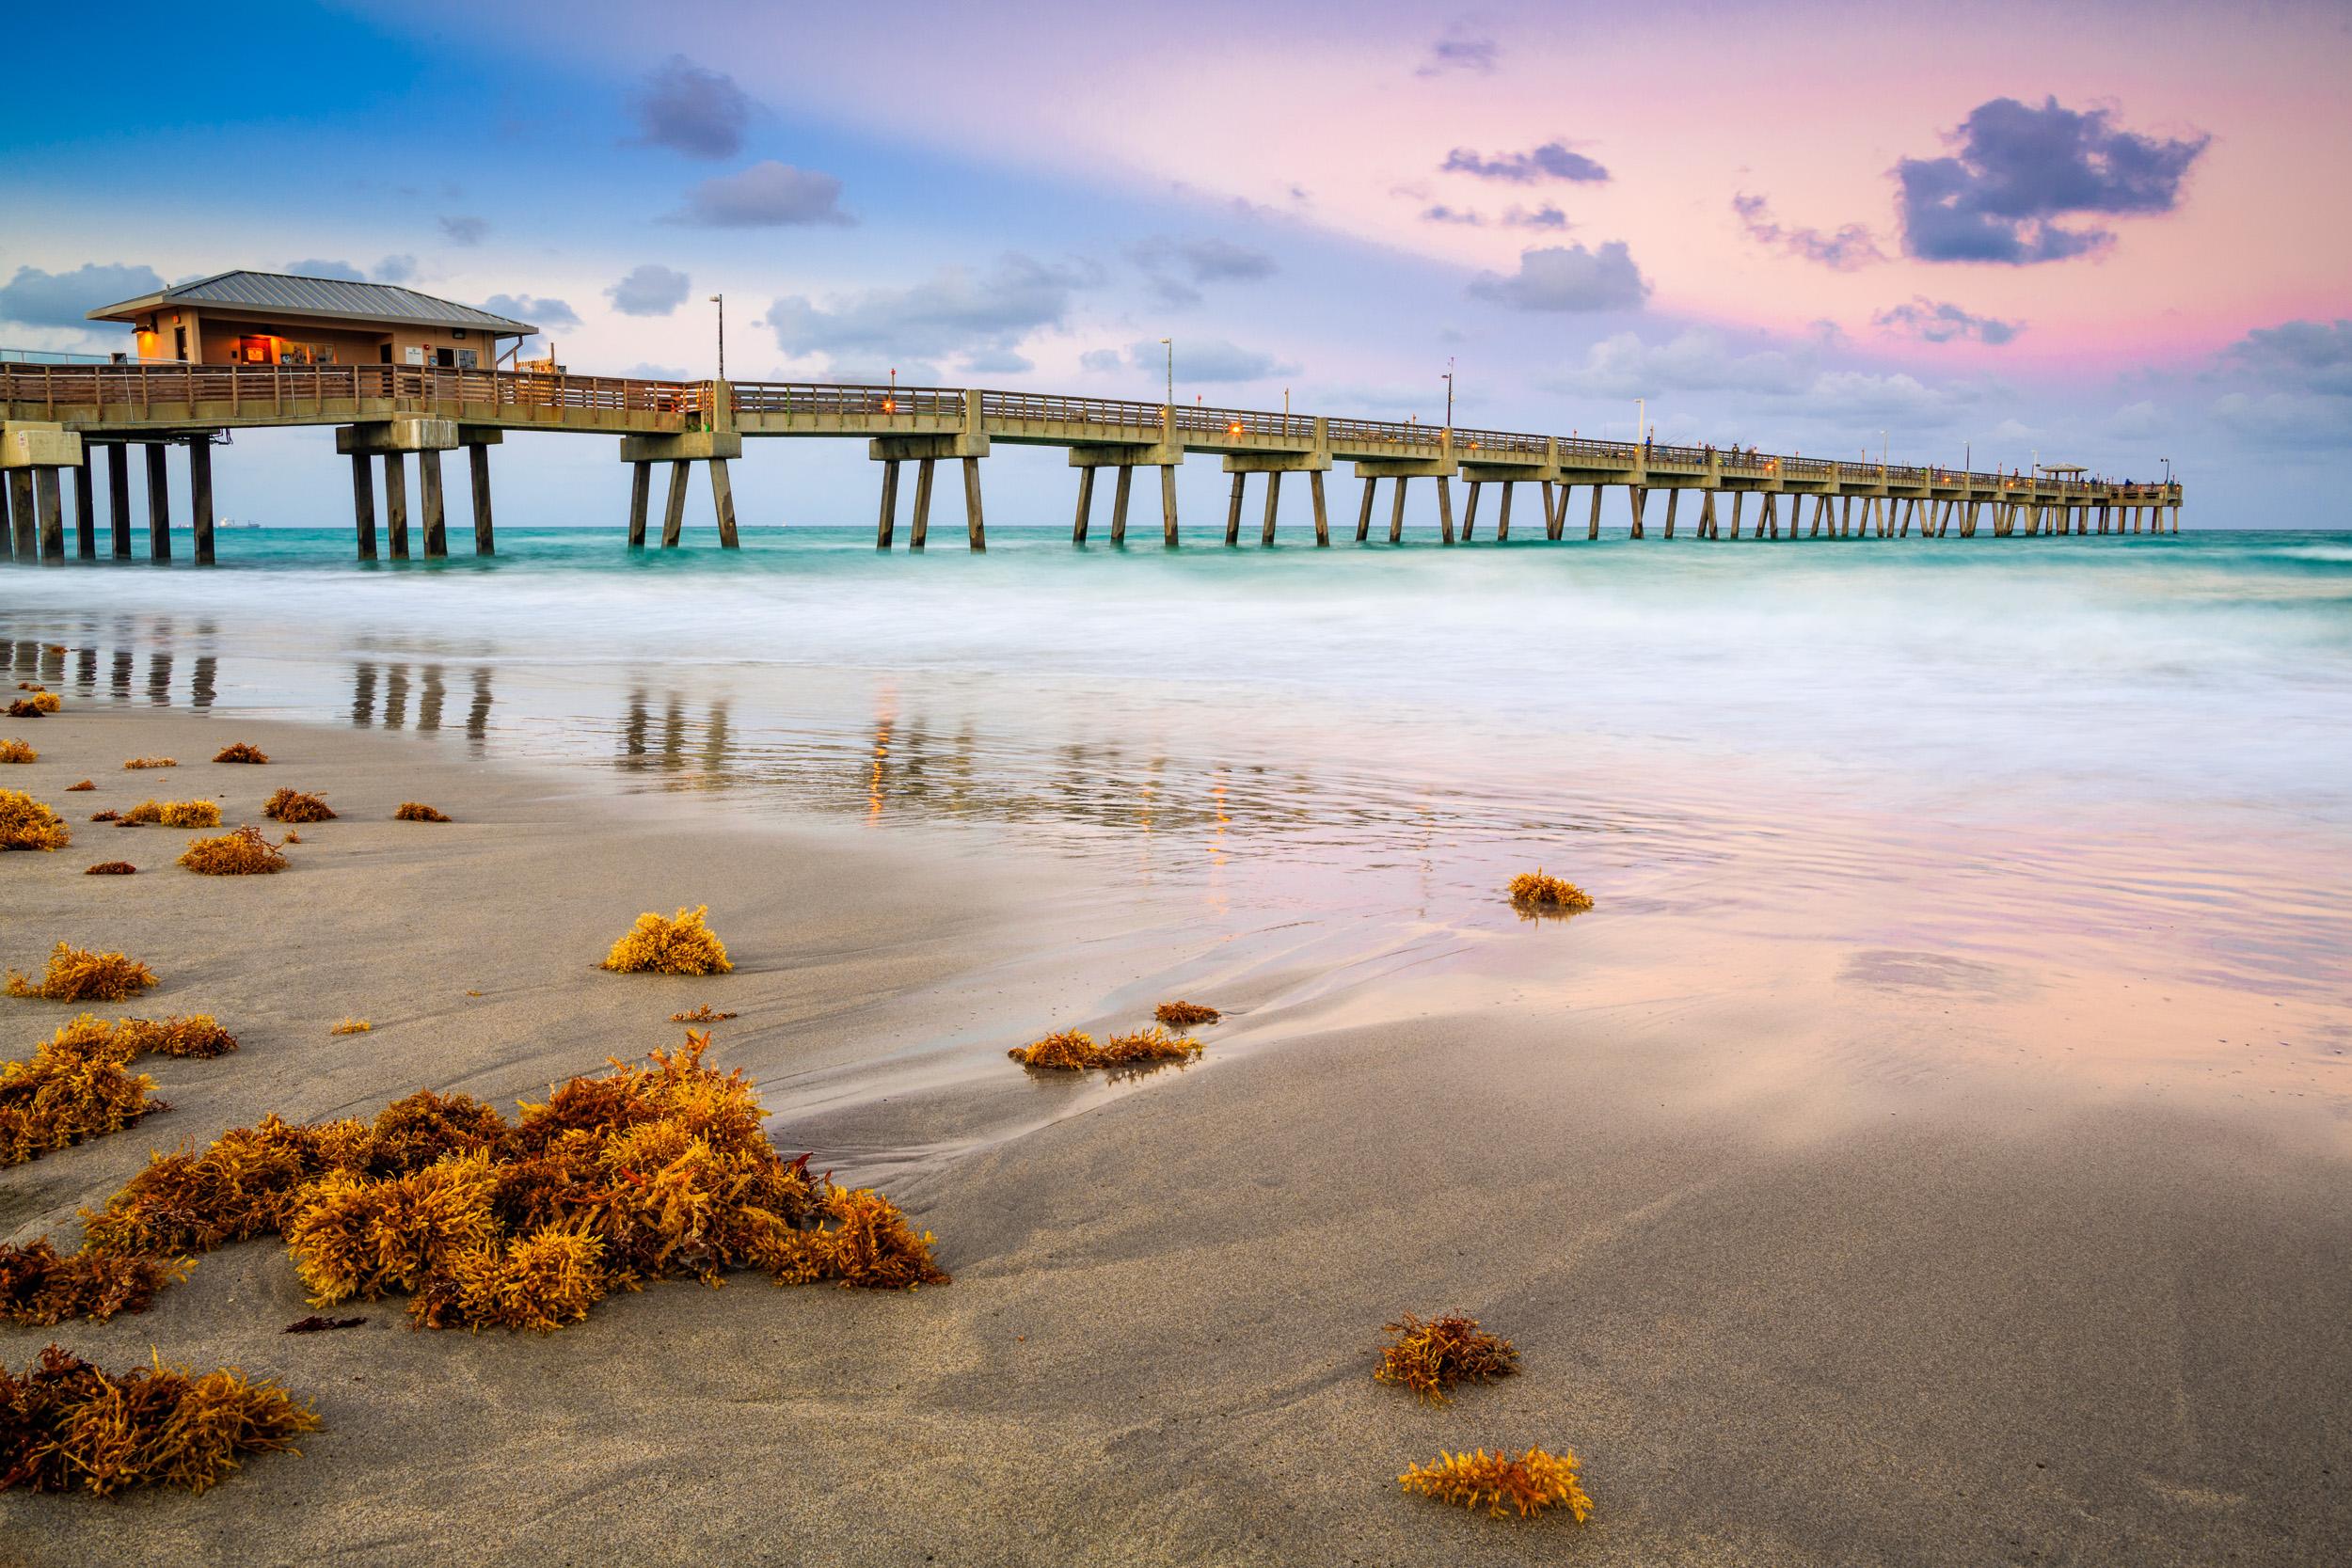 Dania_Beach_Pier_Sunset_Miami_Fort_Lauderdale_commercial_photographer_Franklin_Castillo.jpg